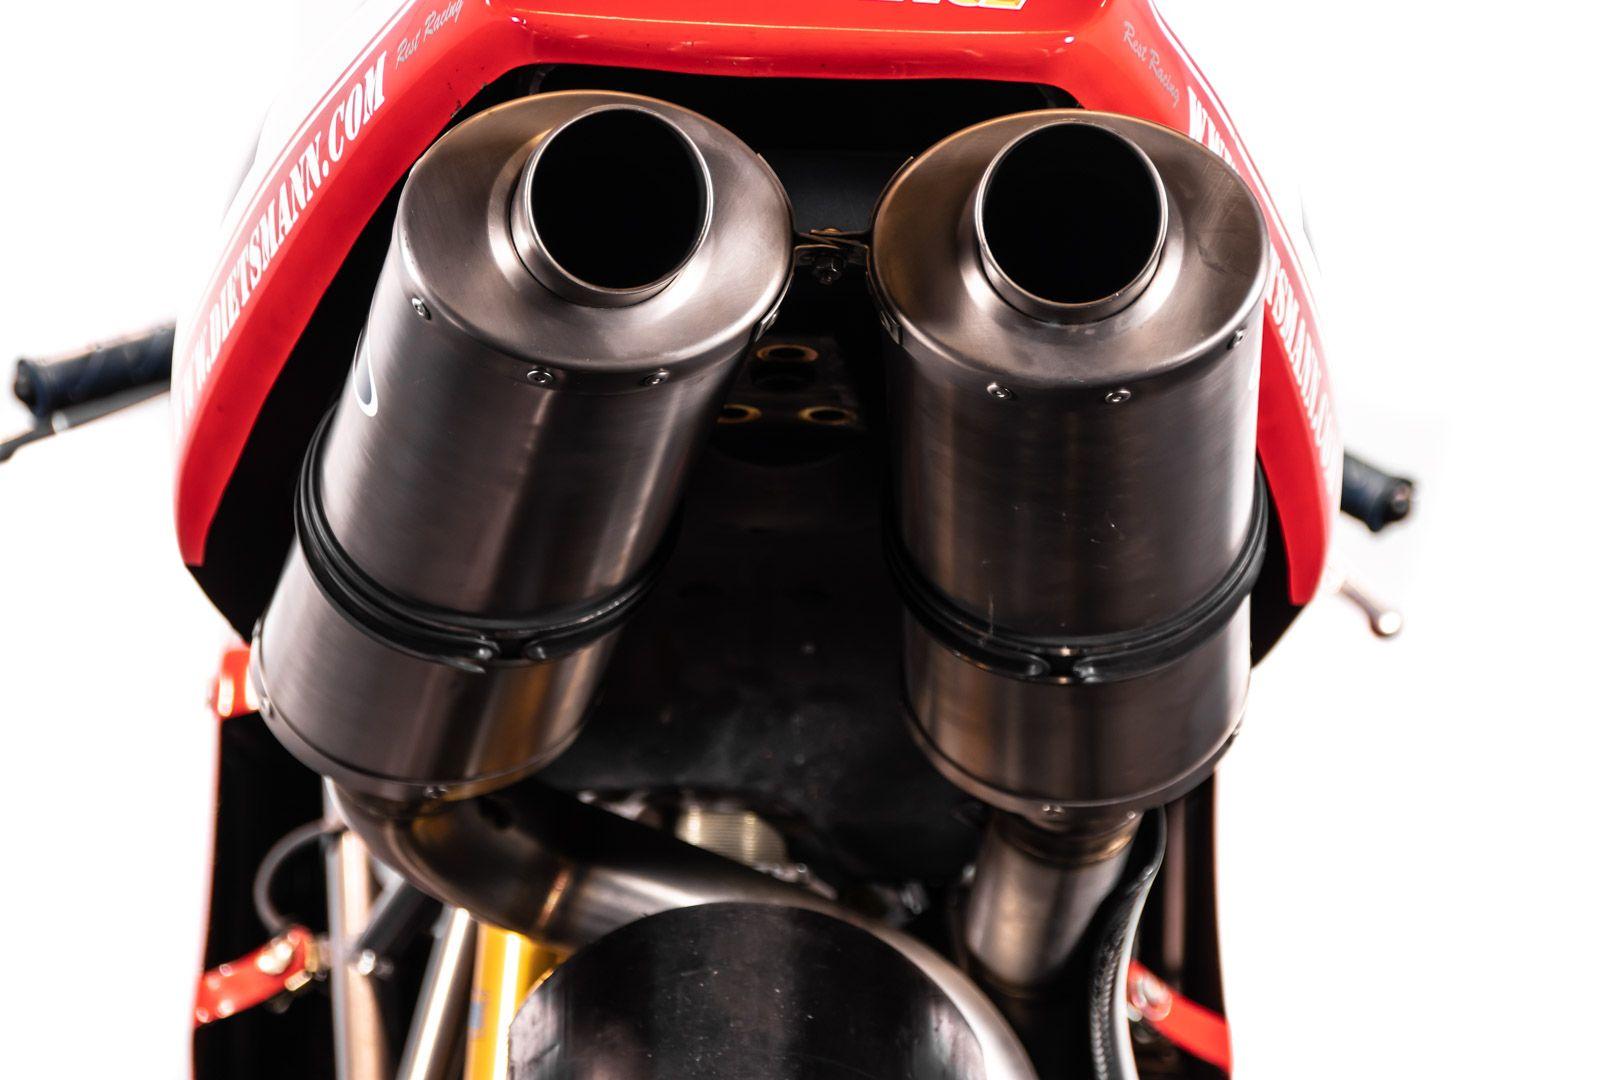 2008 Ducati 996 Fogarty Evocation 03/12 84217